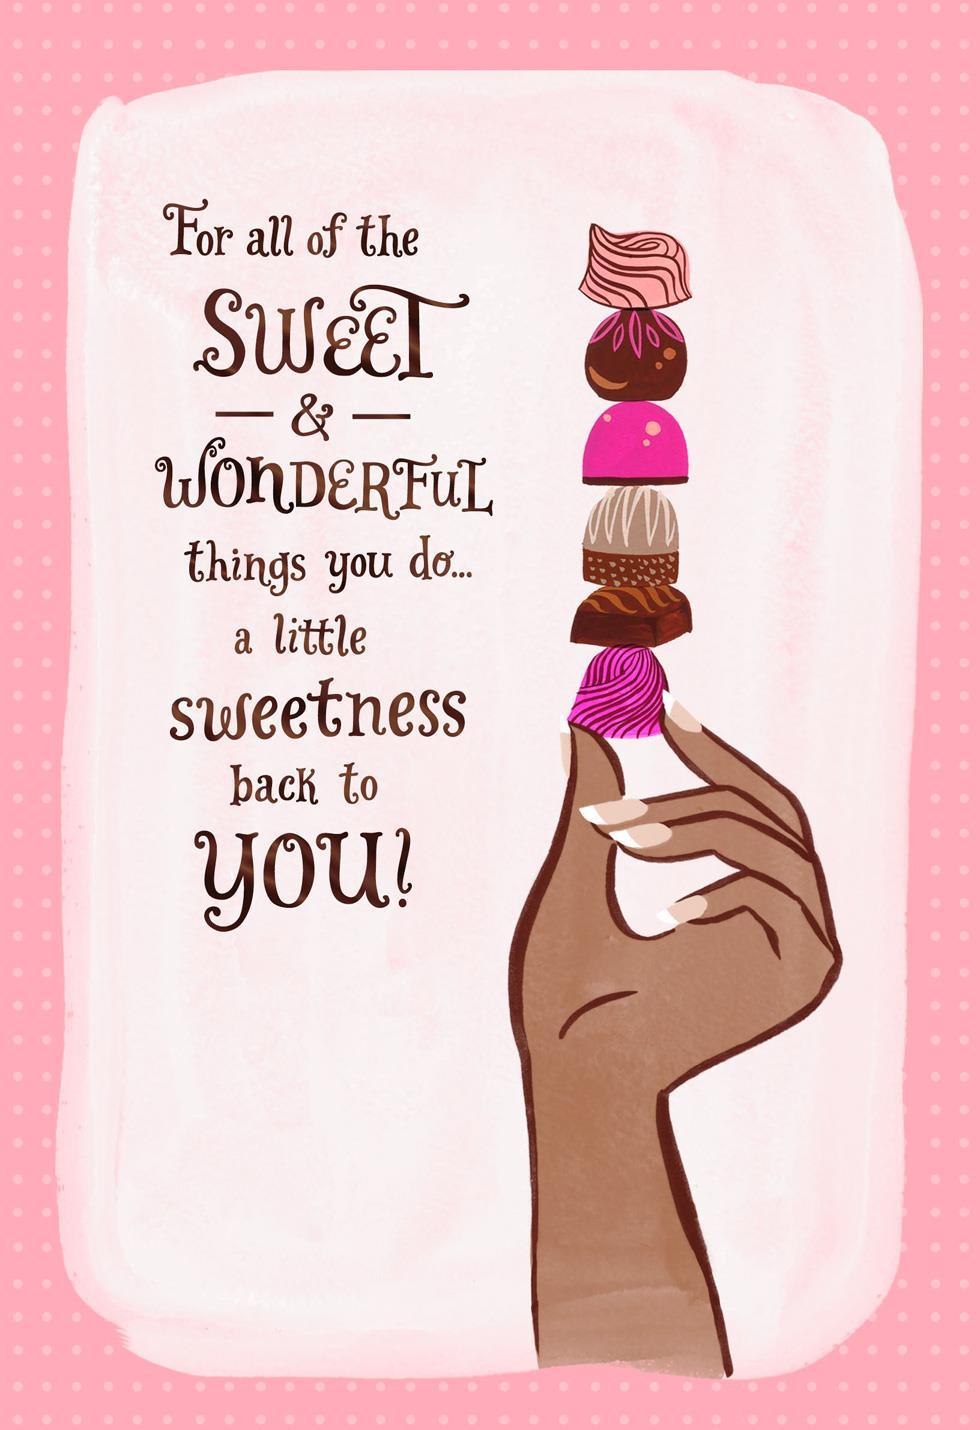 Chocolate Candy Thank You Card - Greeting Cards - Hallmark